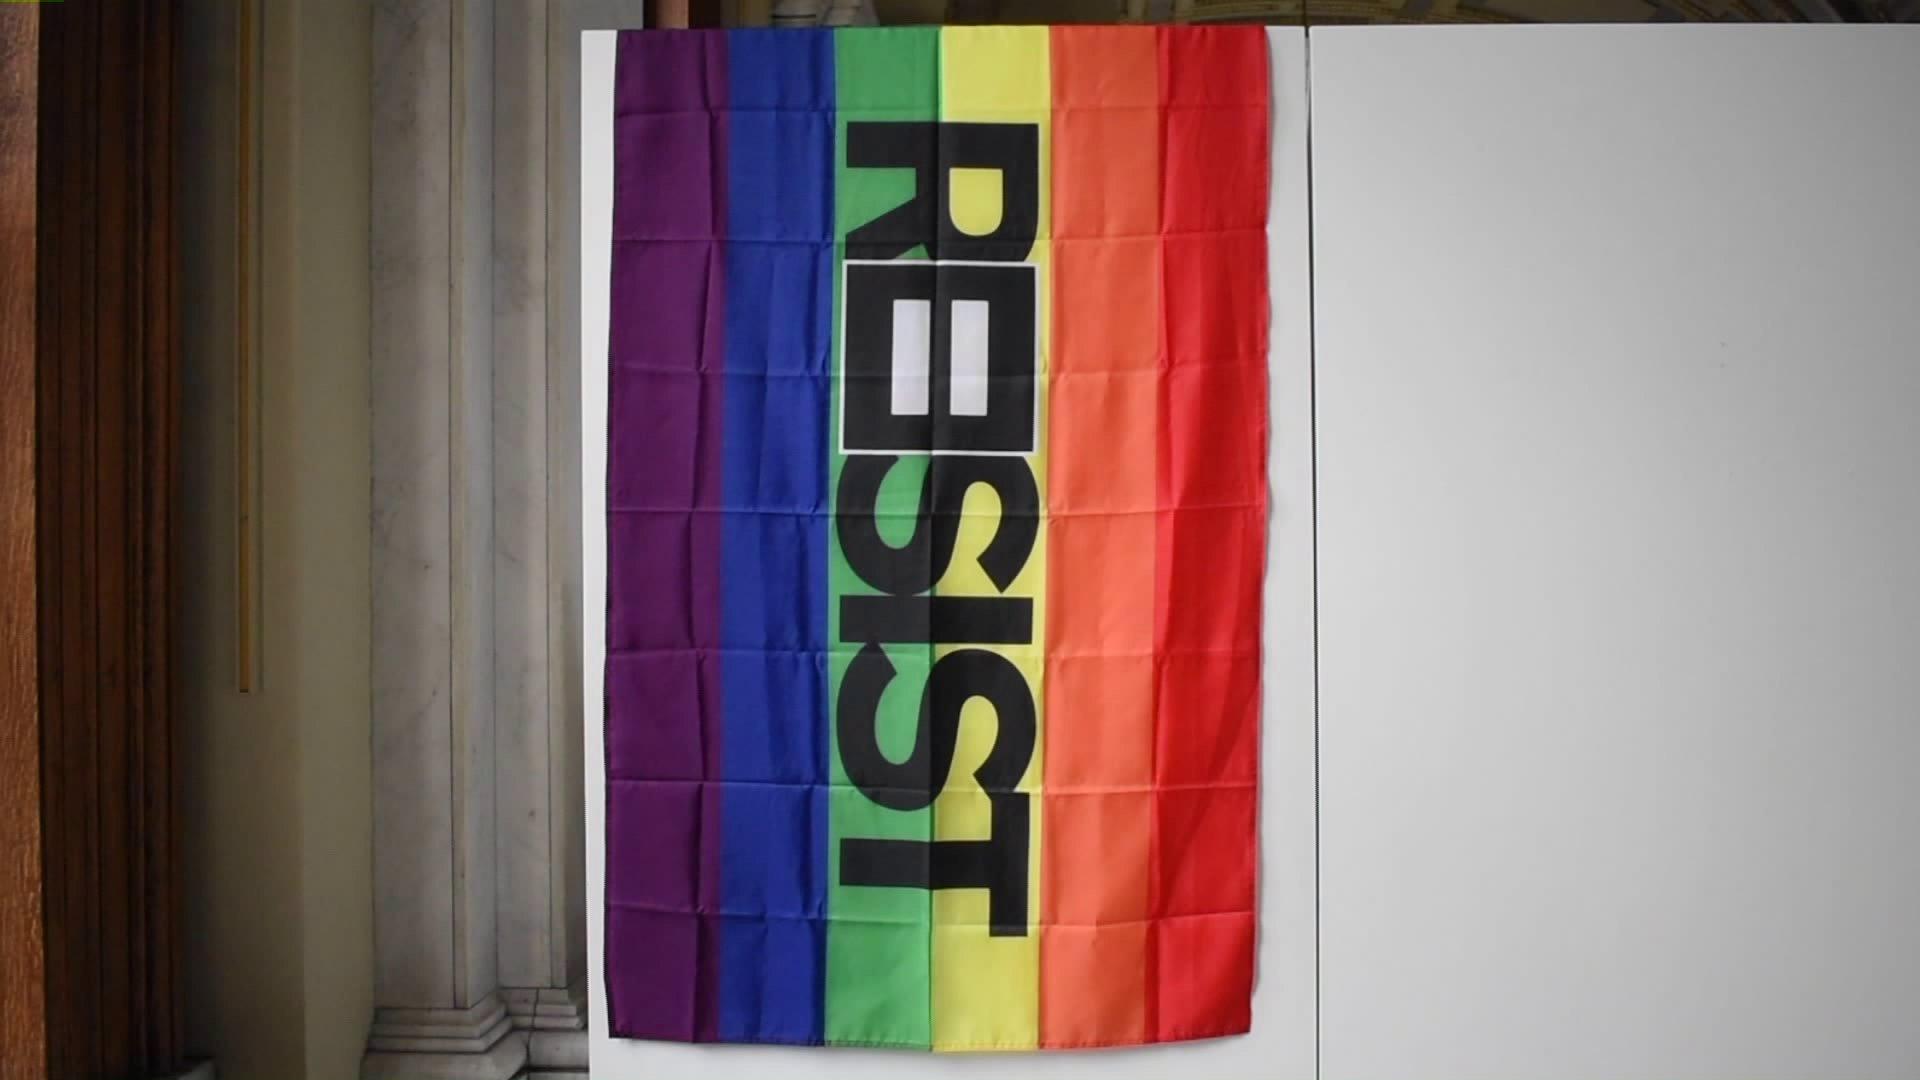 One Iowa Reacts to 'Anti-LGBTQ' Legislation Introduced 1